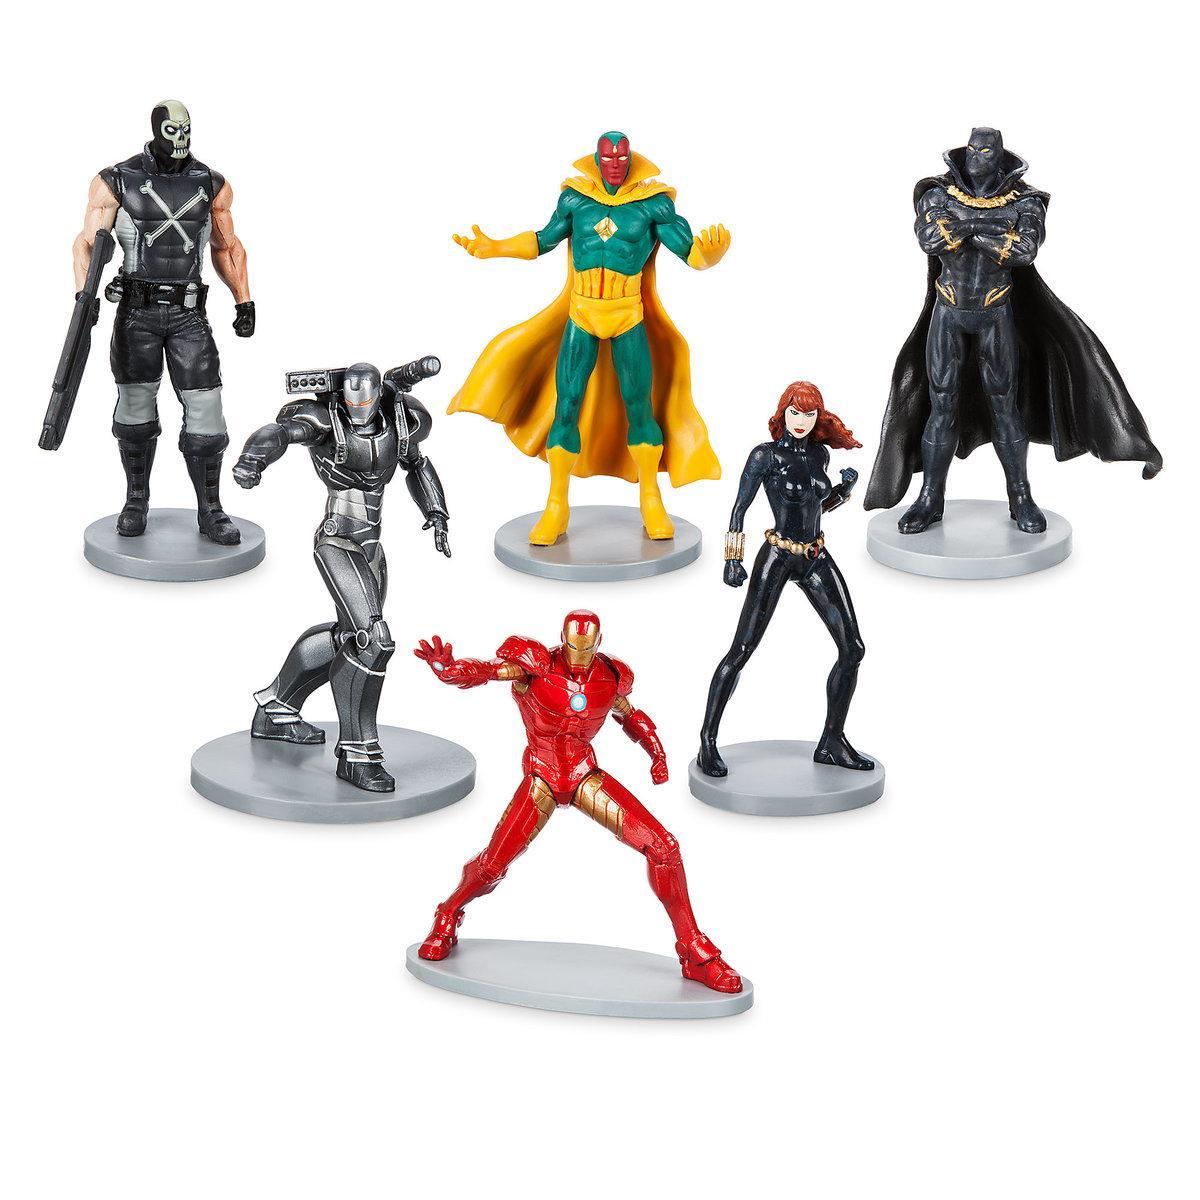 Набор фигурок Мстители Дисней - 2 Капитан Америка Avengers Marvel